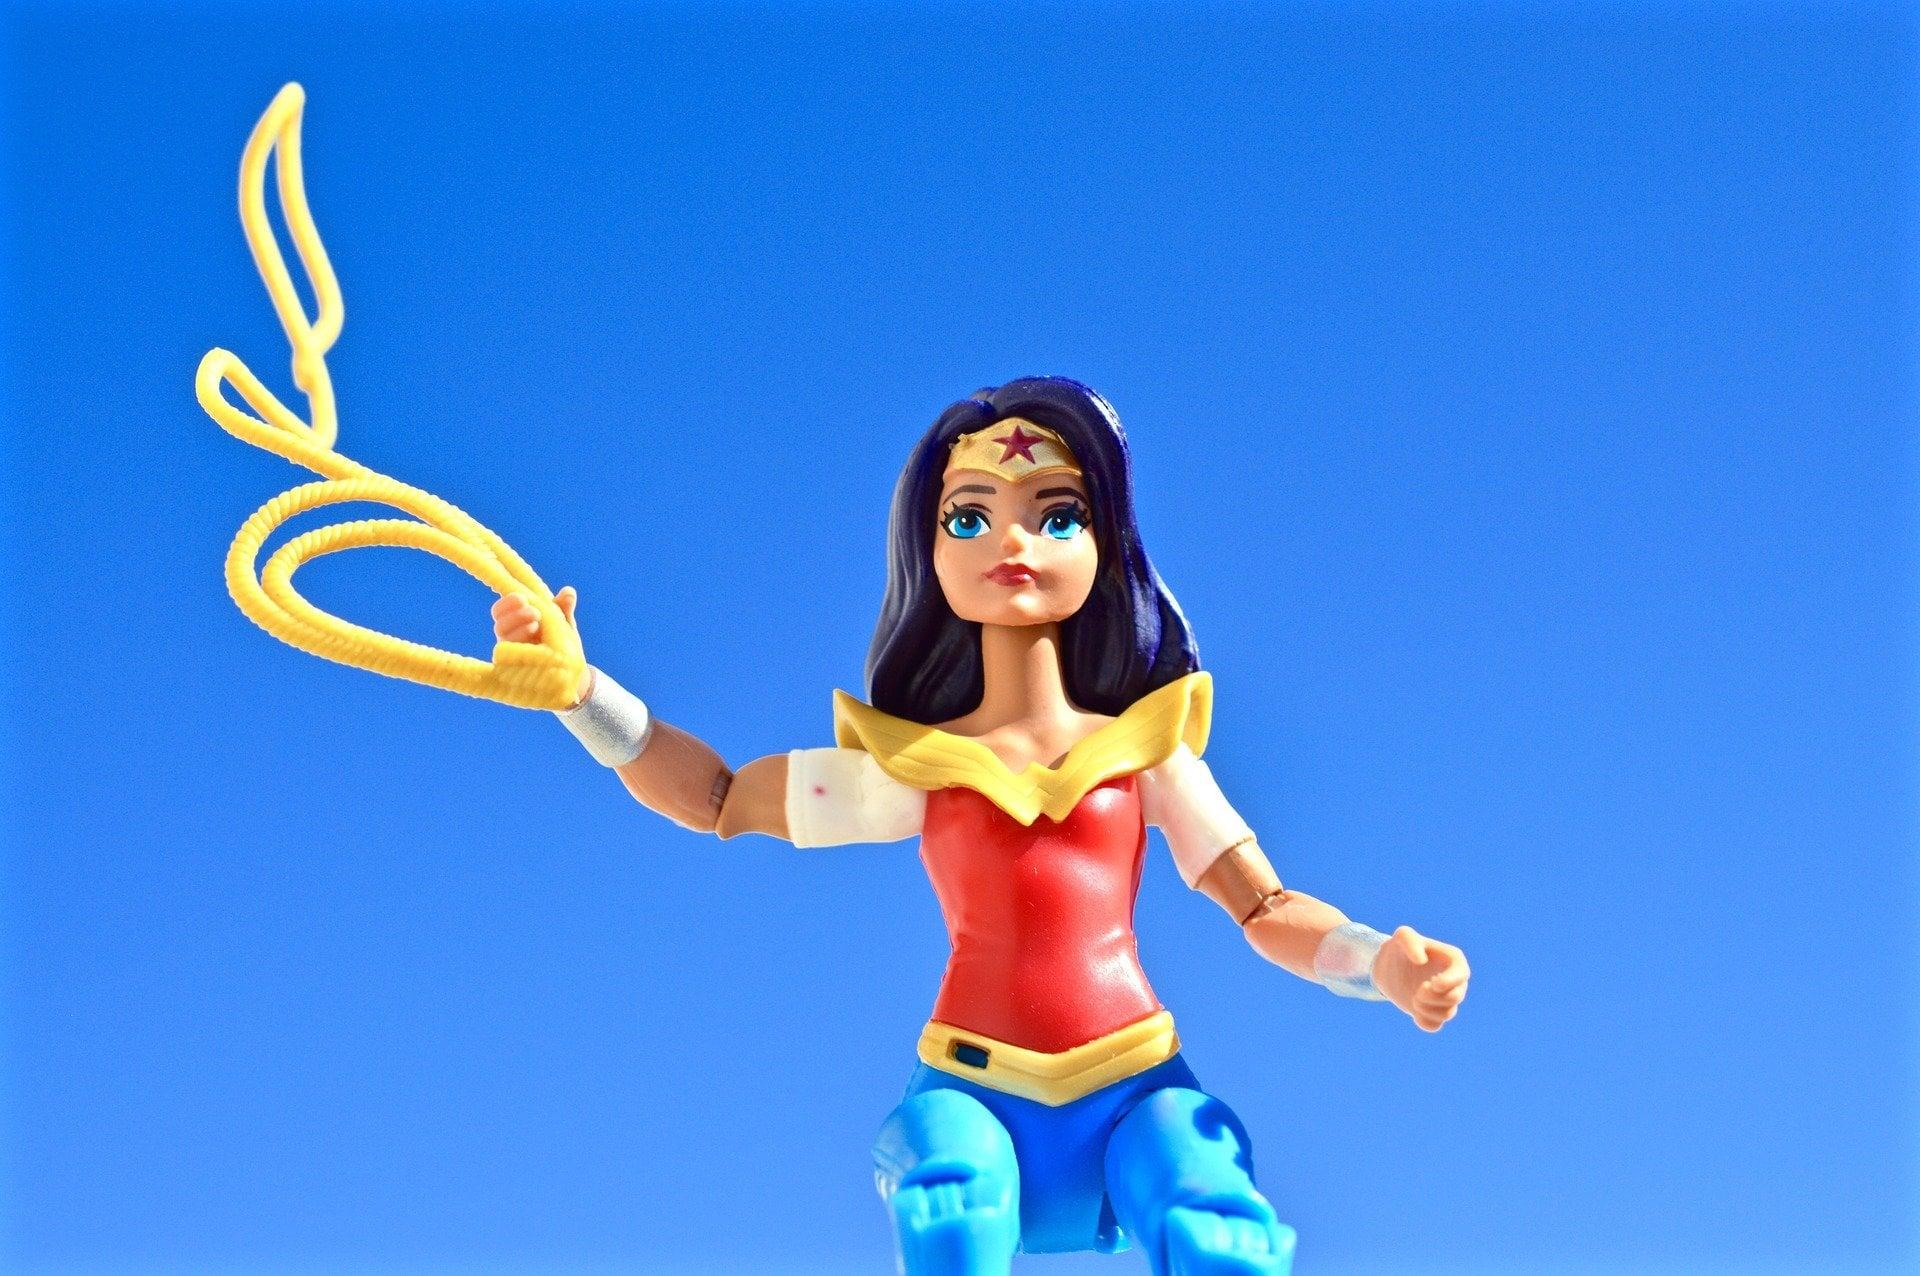 Marston Wonder Woman,